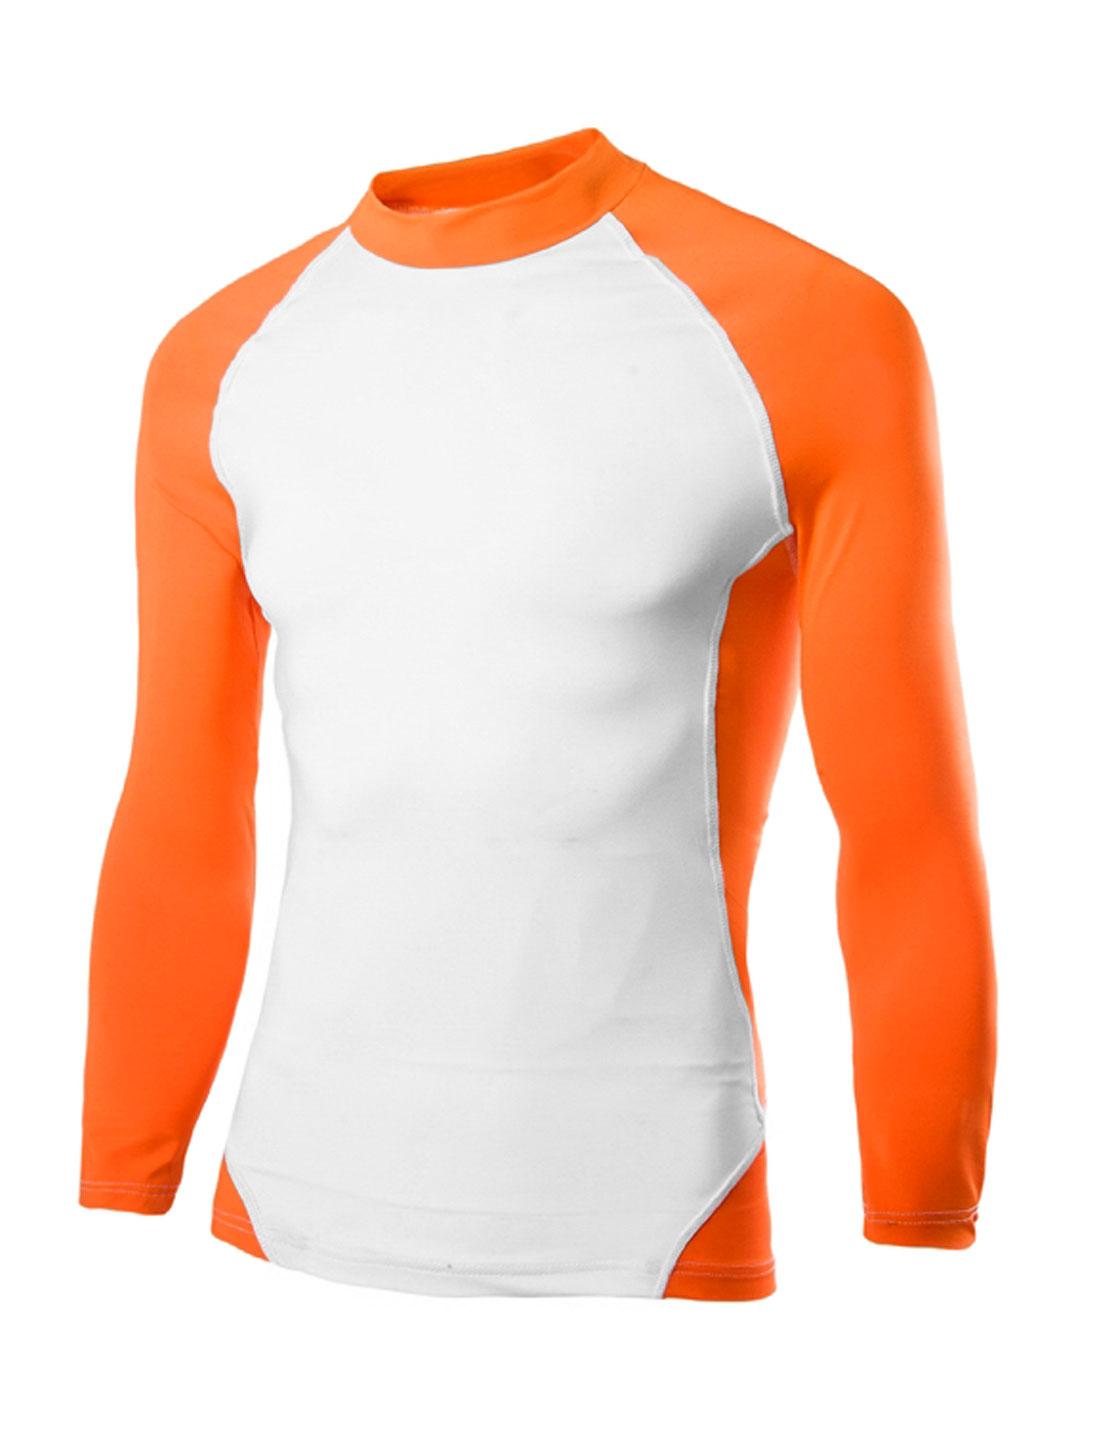 Men Contrast Color Raglan Sleeves Sports T-Shirt Orange White M